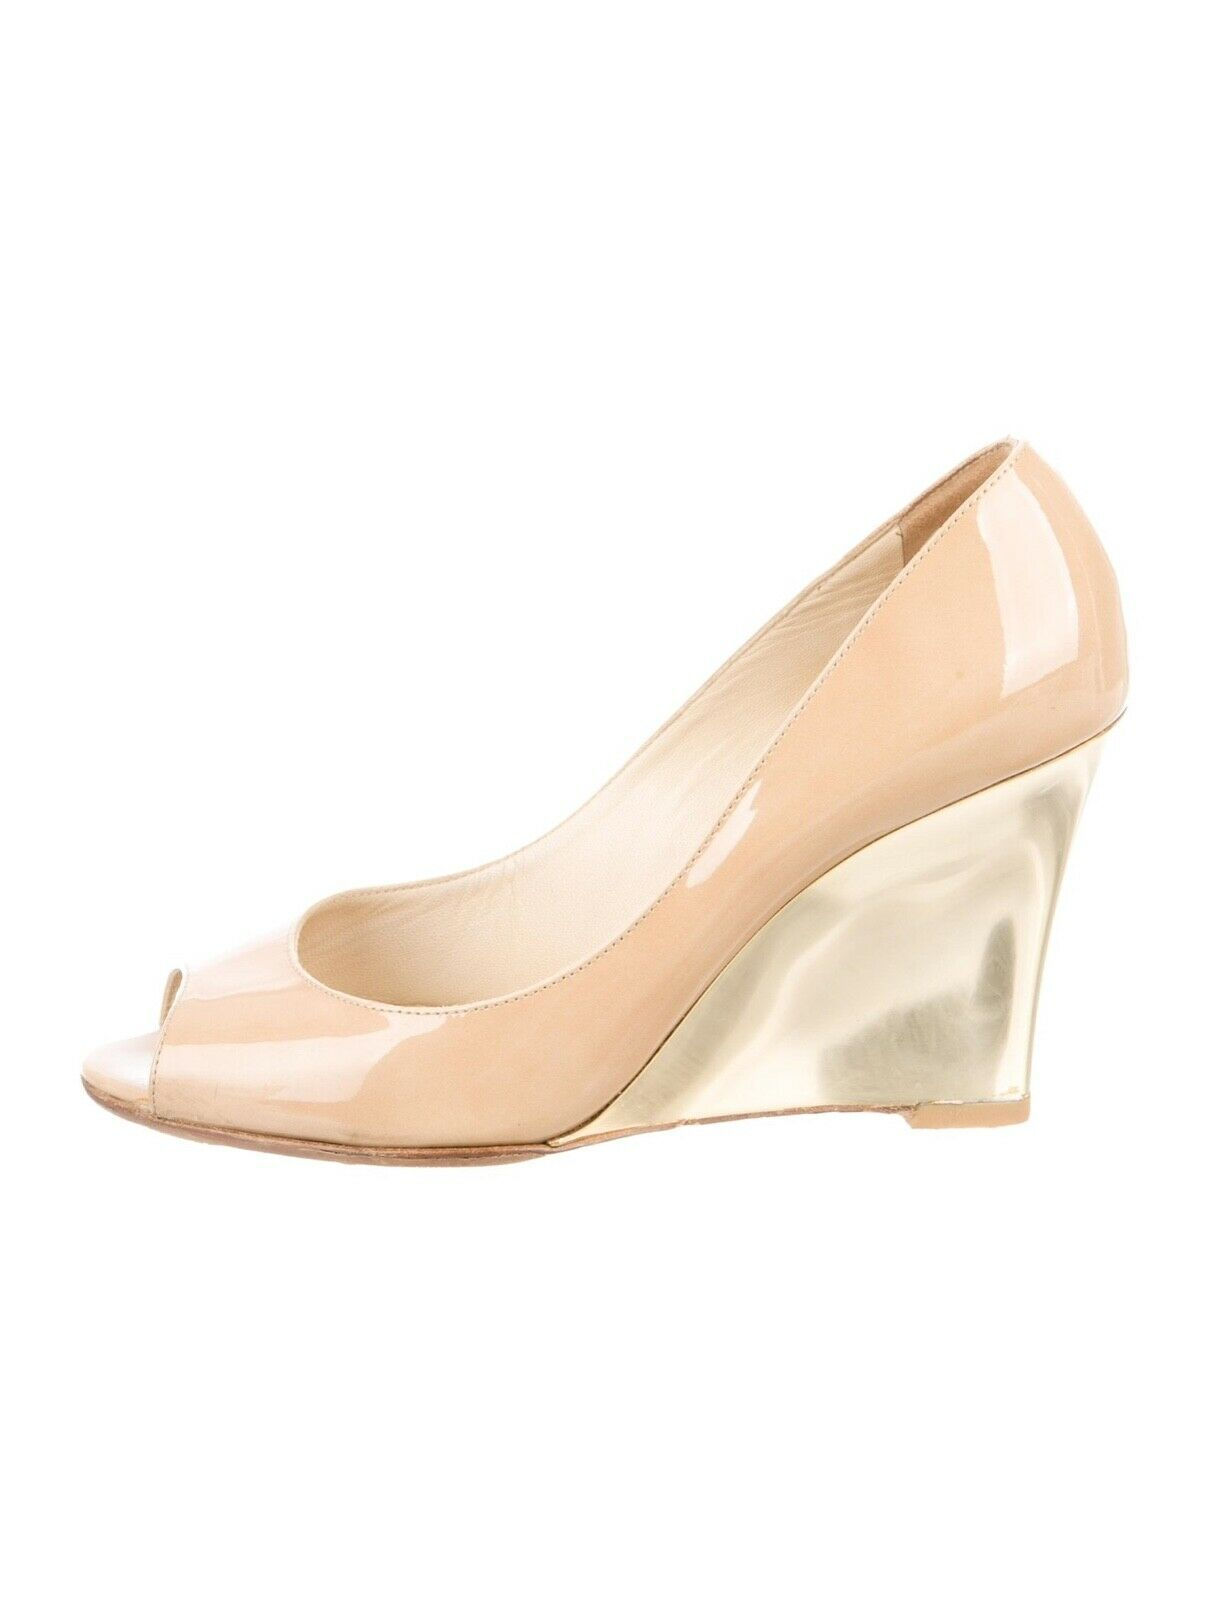 Jimmy Choo Baxen Patent Leather Wedge, Peep Toe, gold, Heel - Nude Size 37